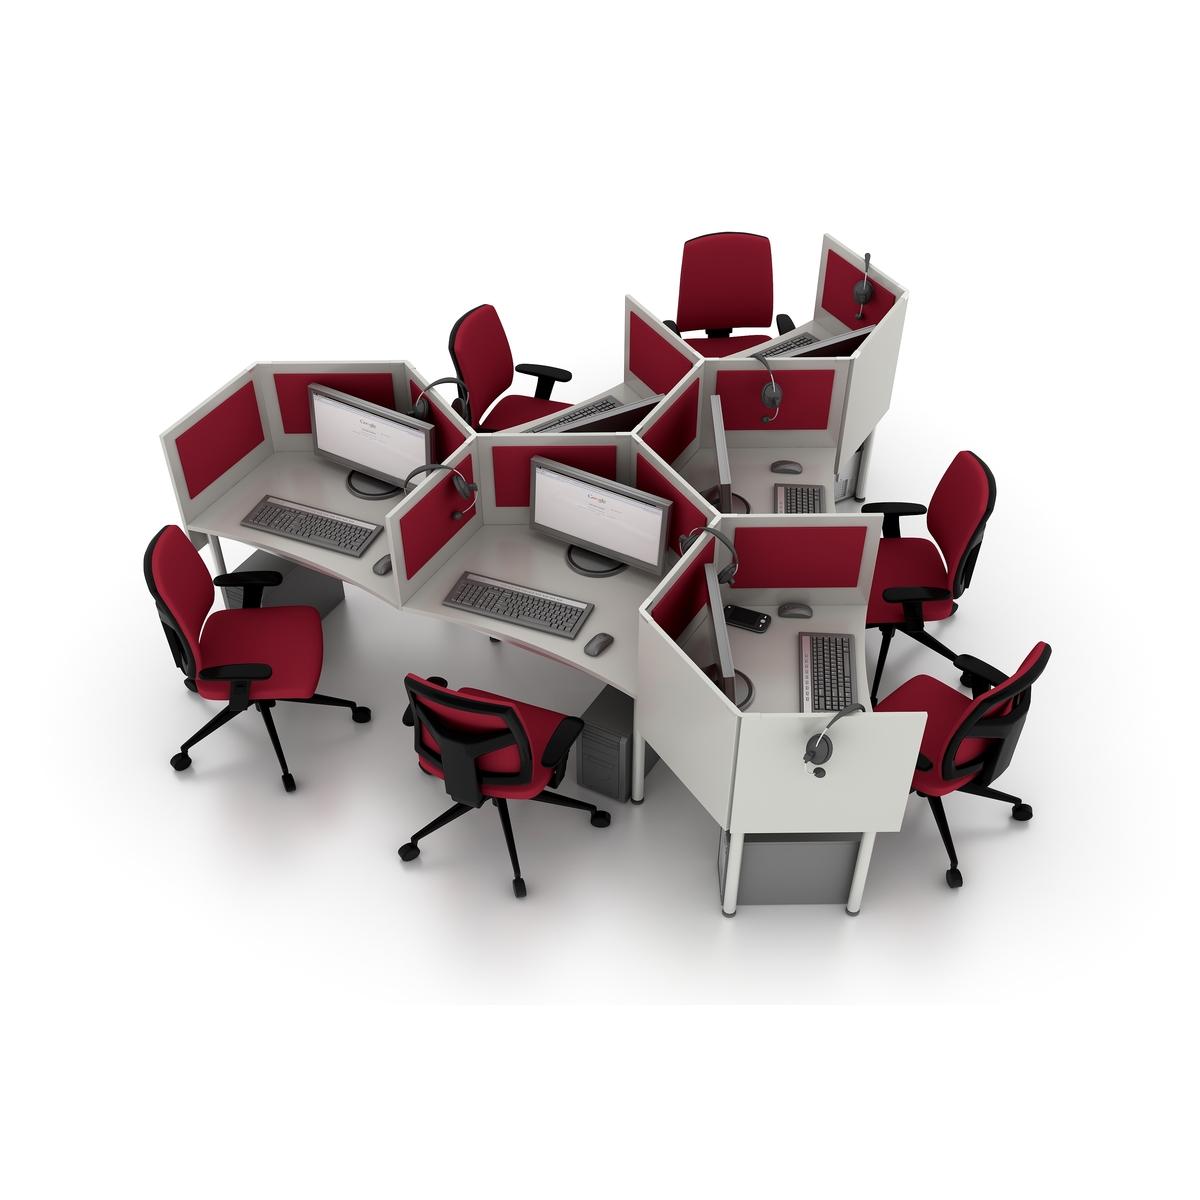 meble biurowe do call center czerwone